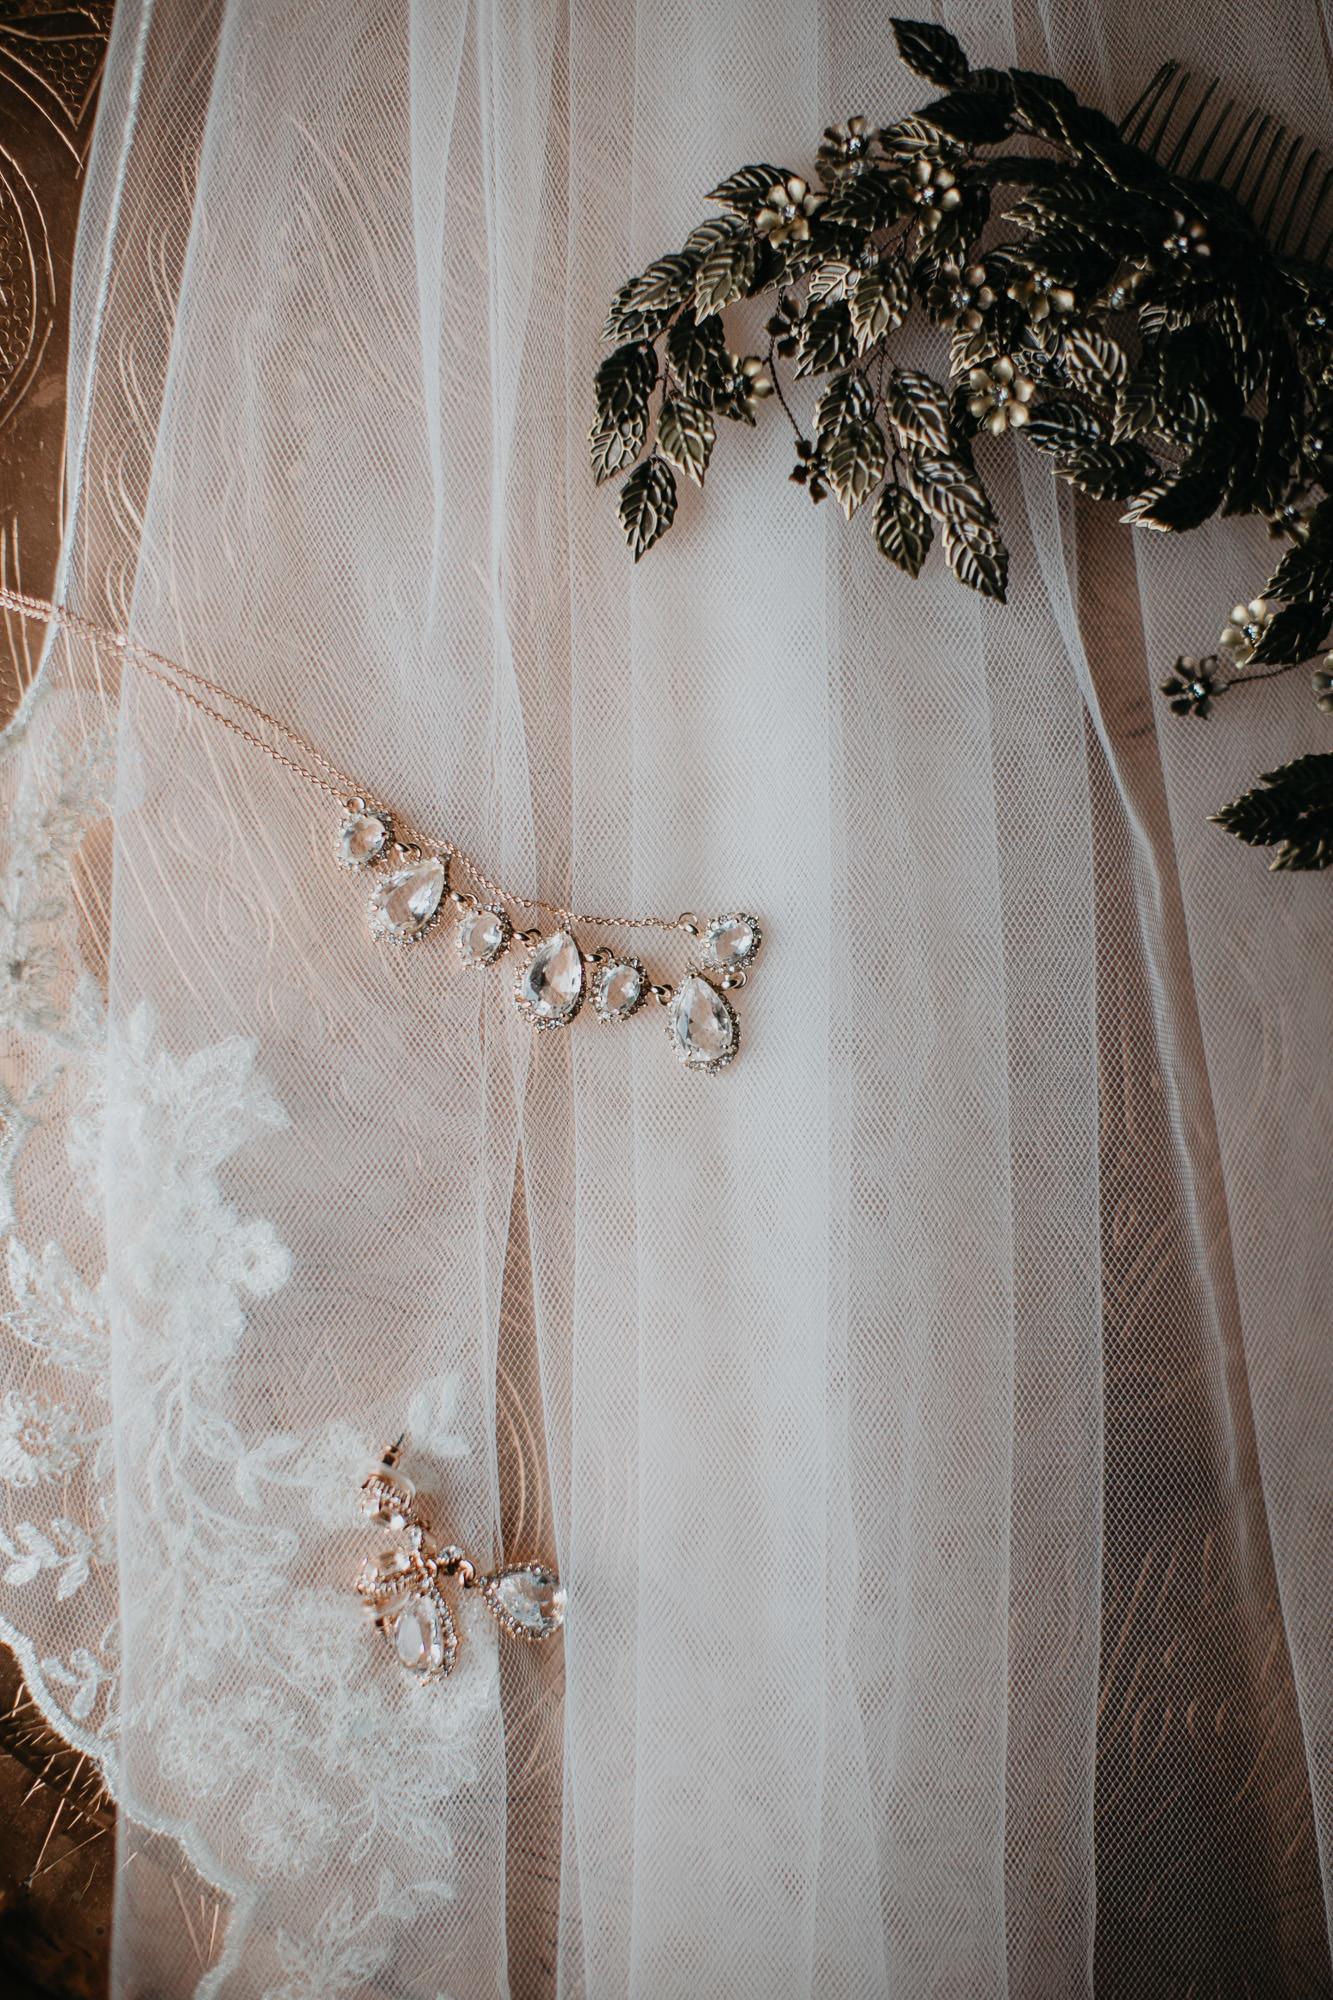 Doe Creek Farm - Weddings - Virginia - Best Wedding Photographer - Pat Cori Photography-4.jpg